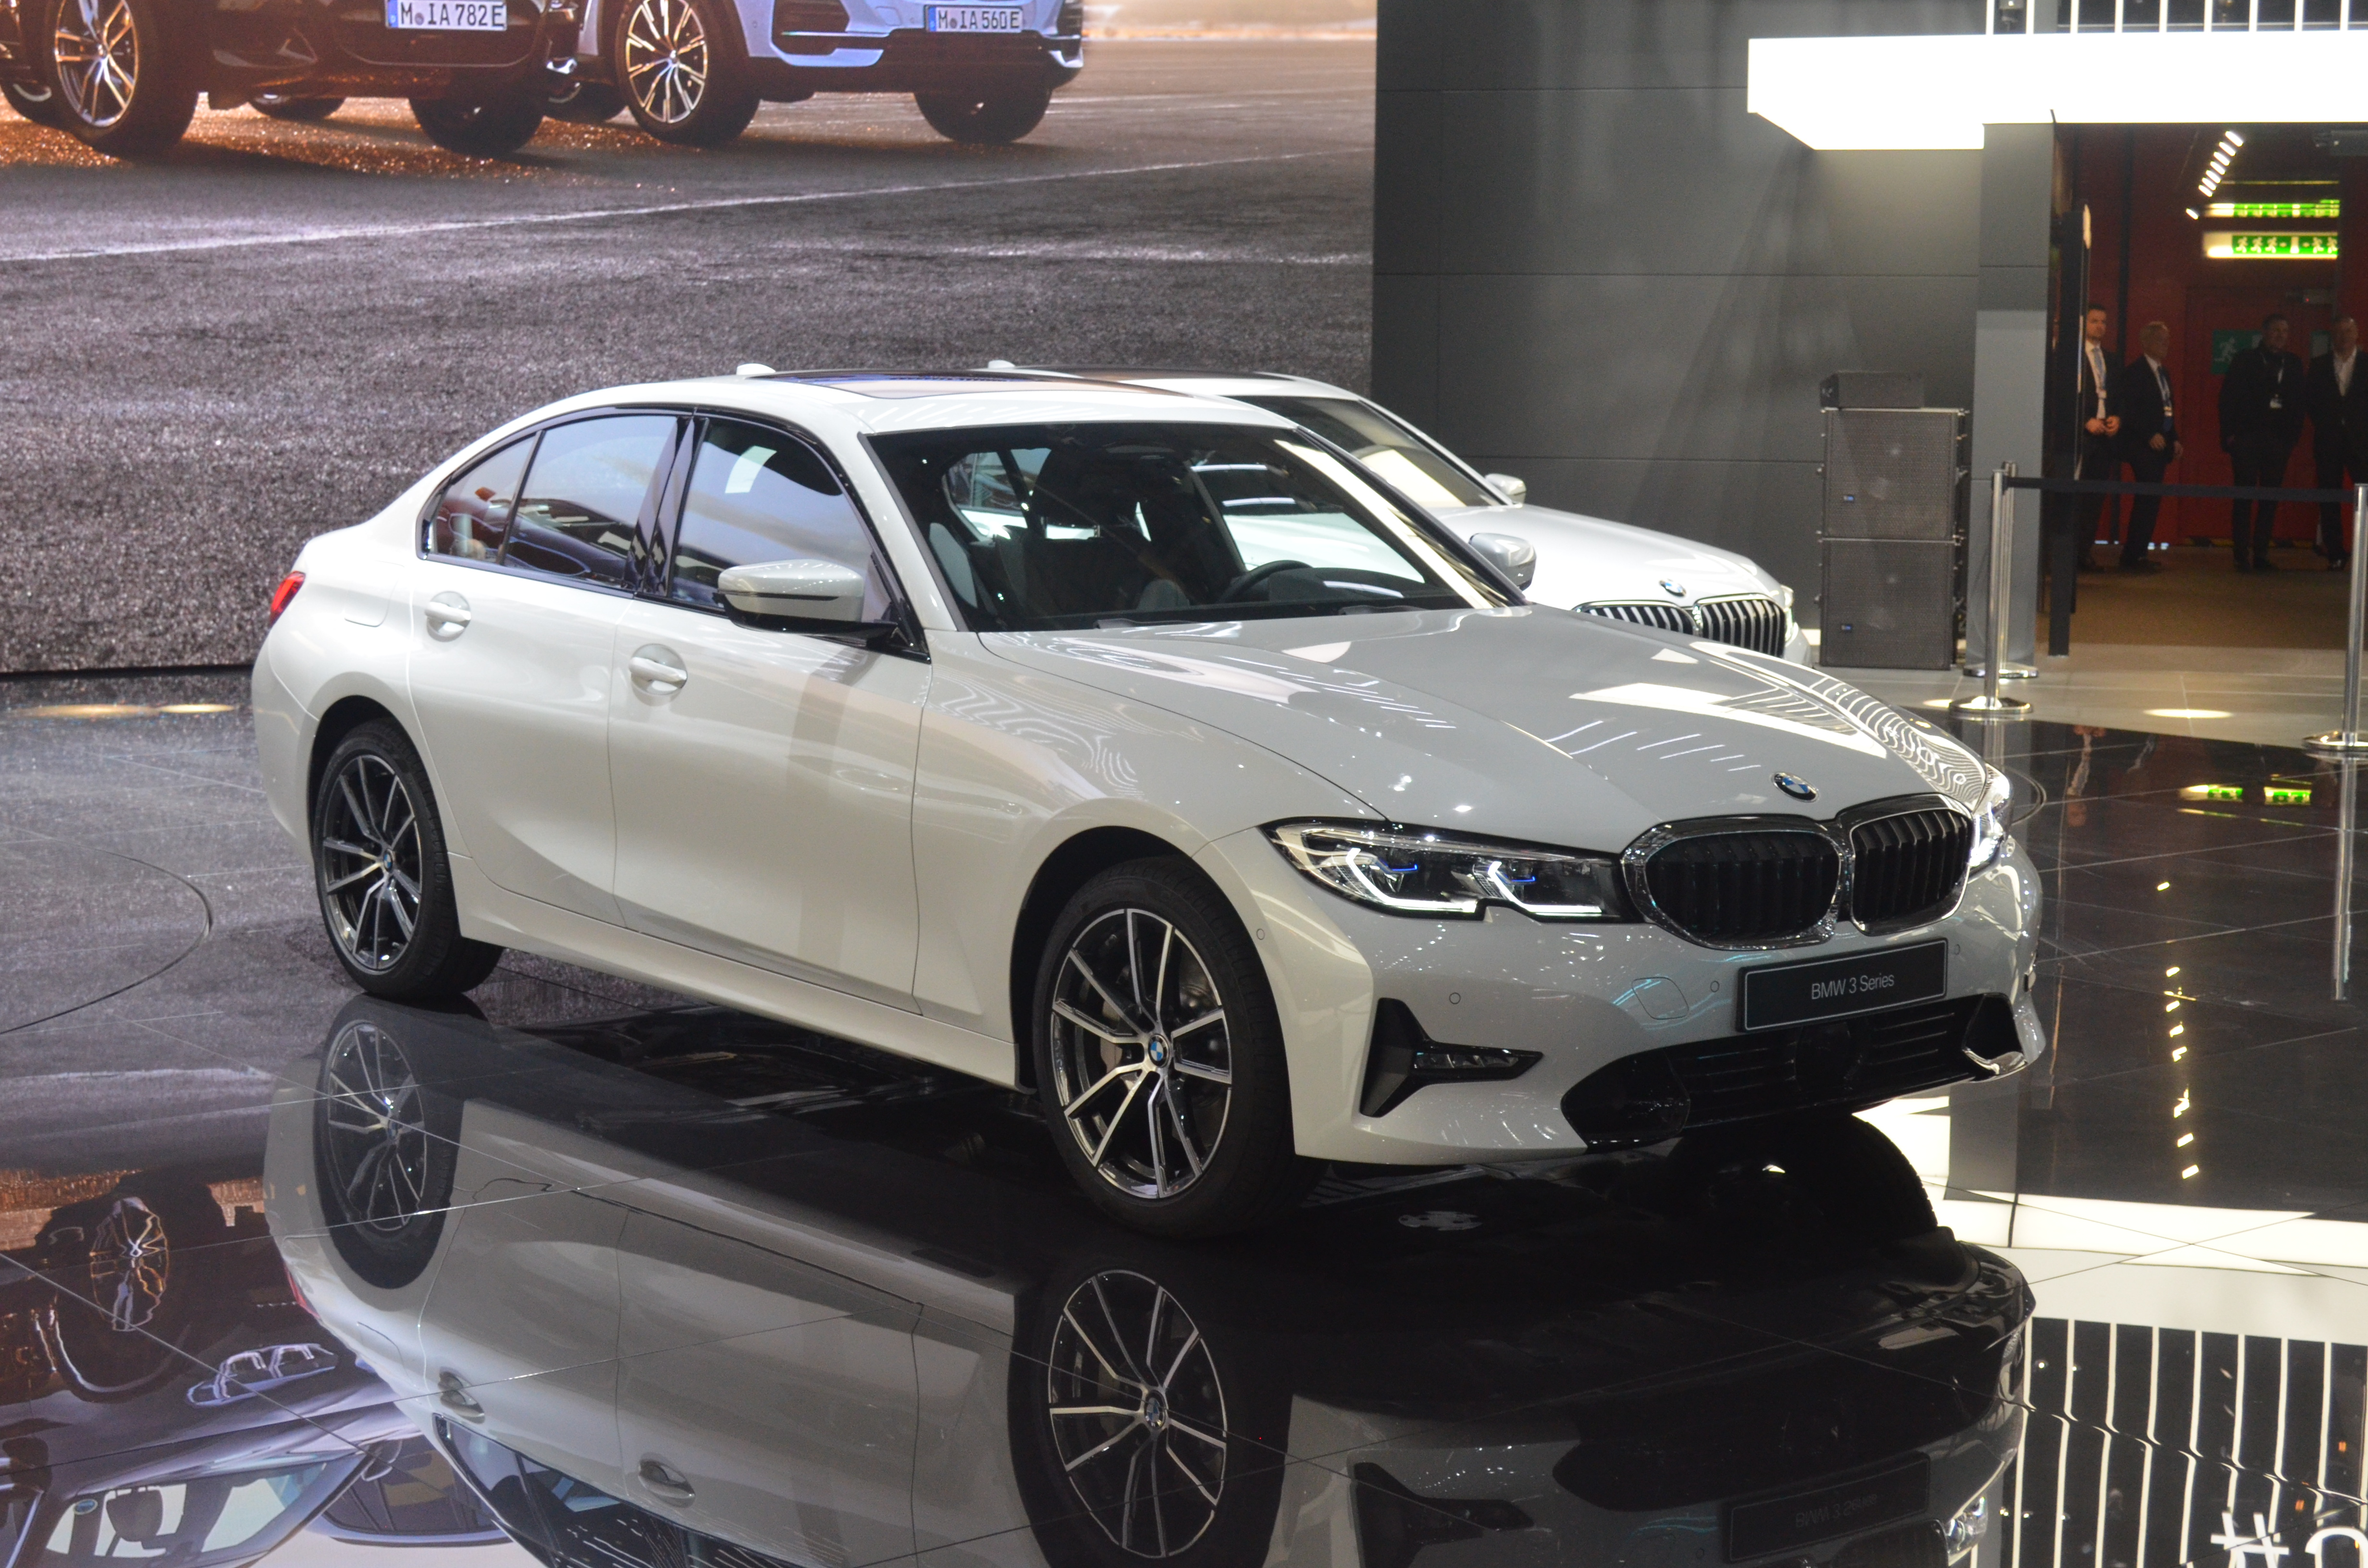 La nuova BMW Serie 3 al Salone di Ginevra 2019